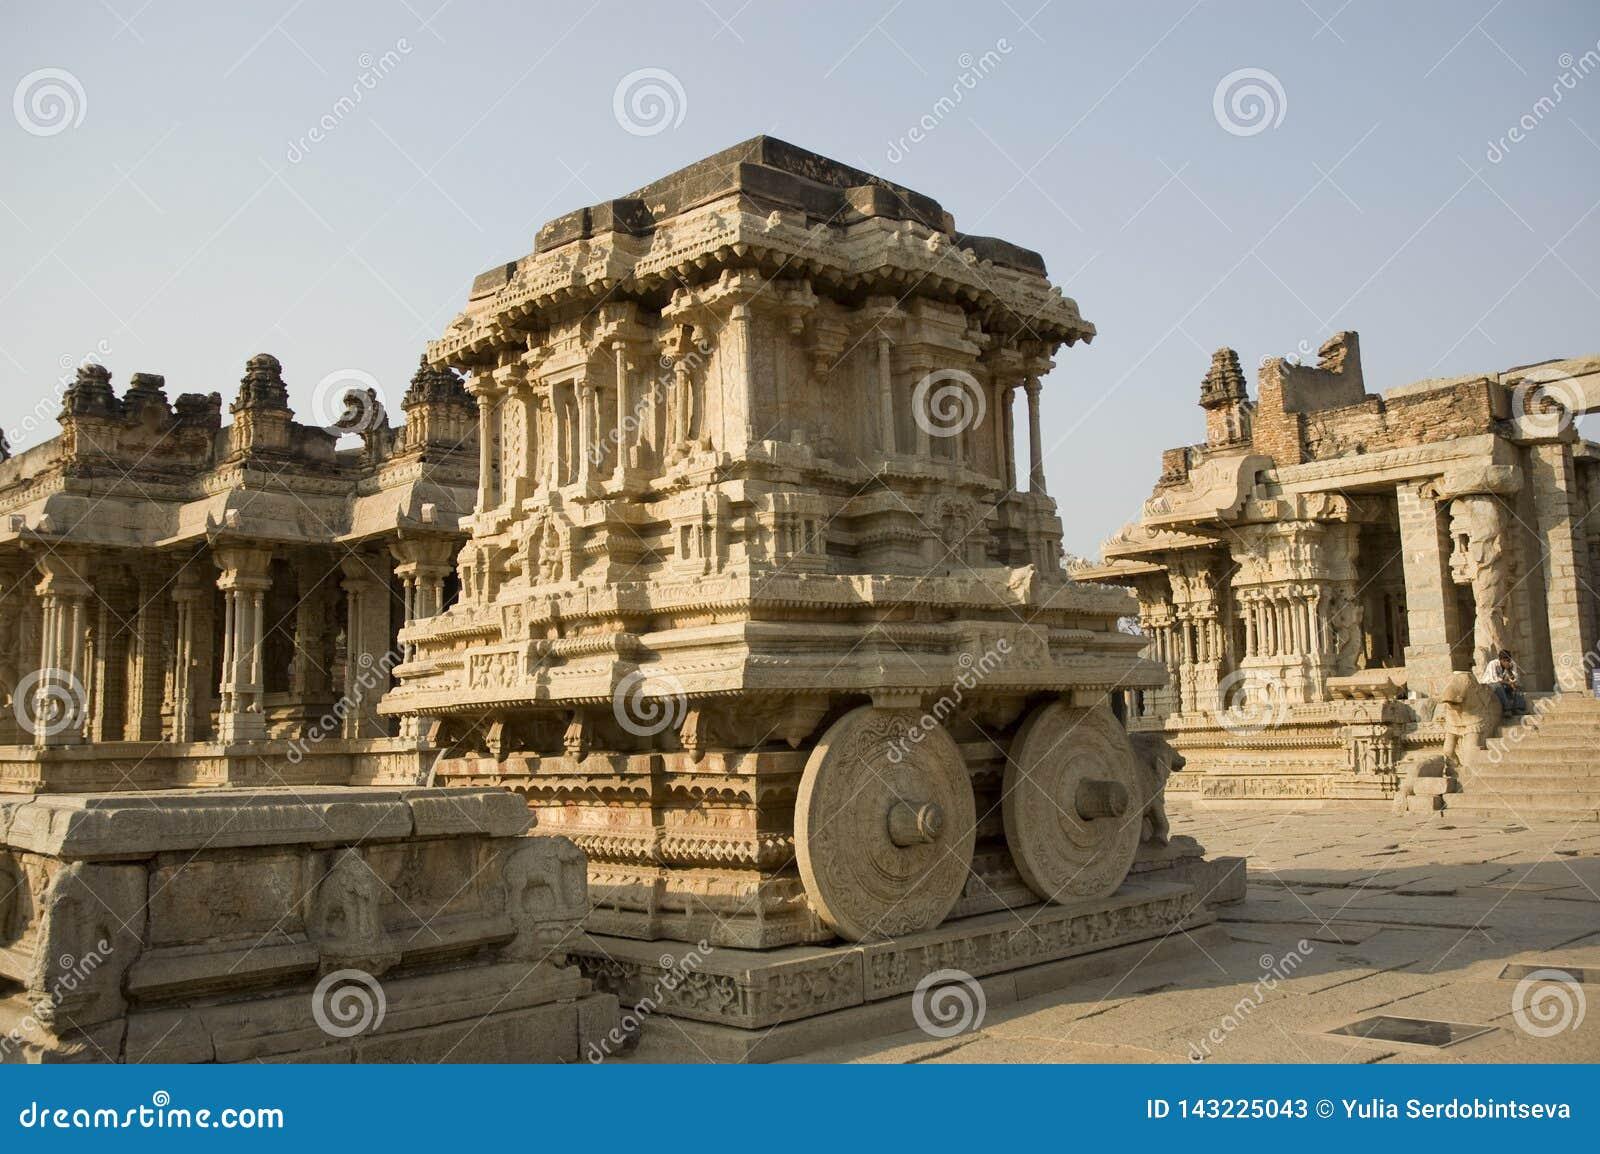 Stone chariot in courtyard of Vittala Temple at sunset in Hampi, Karnataka, India